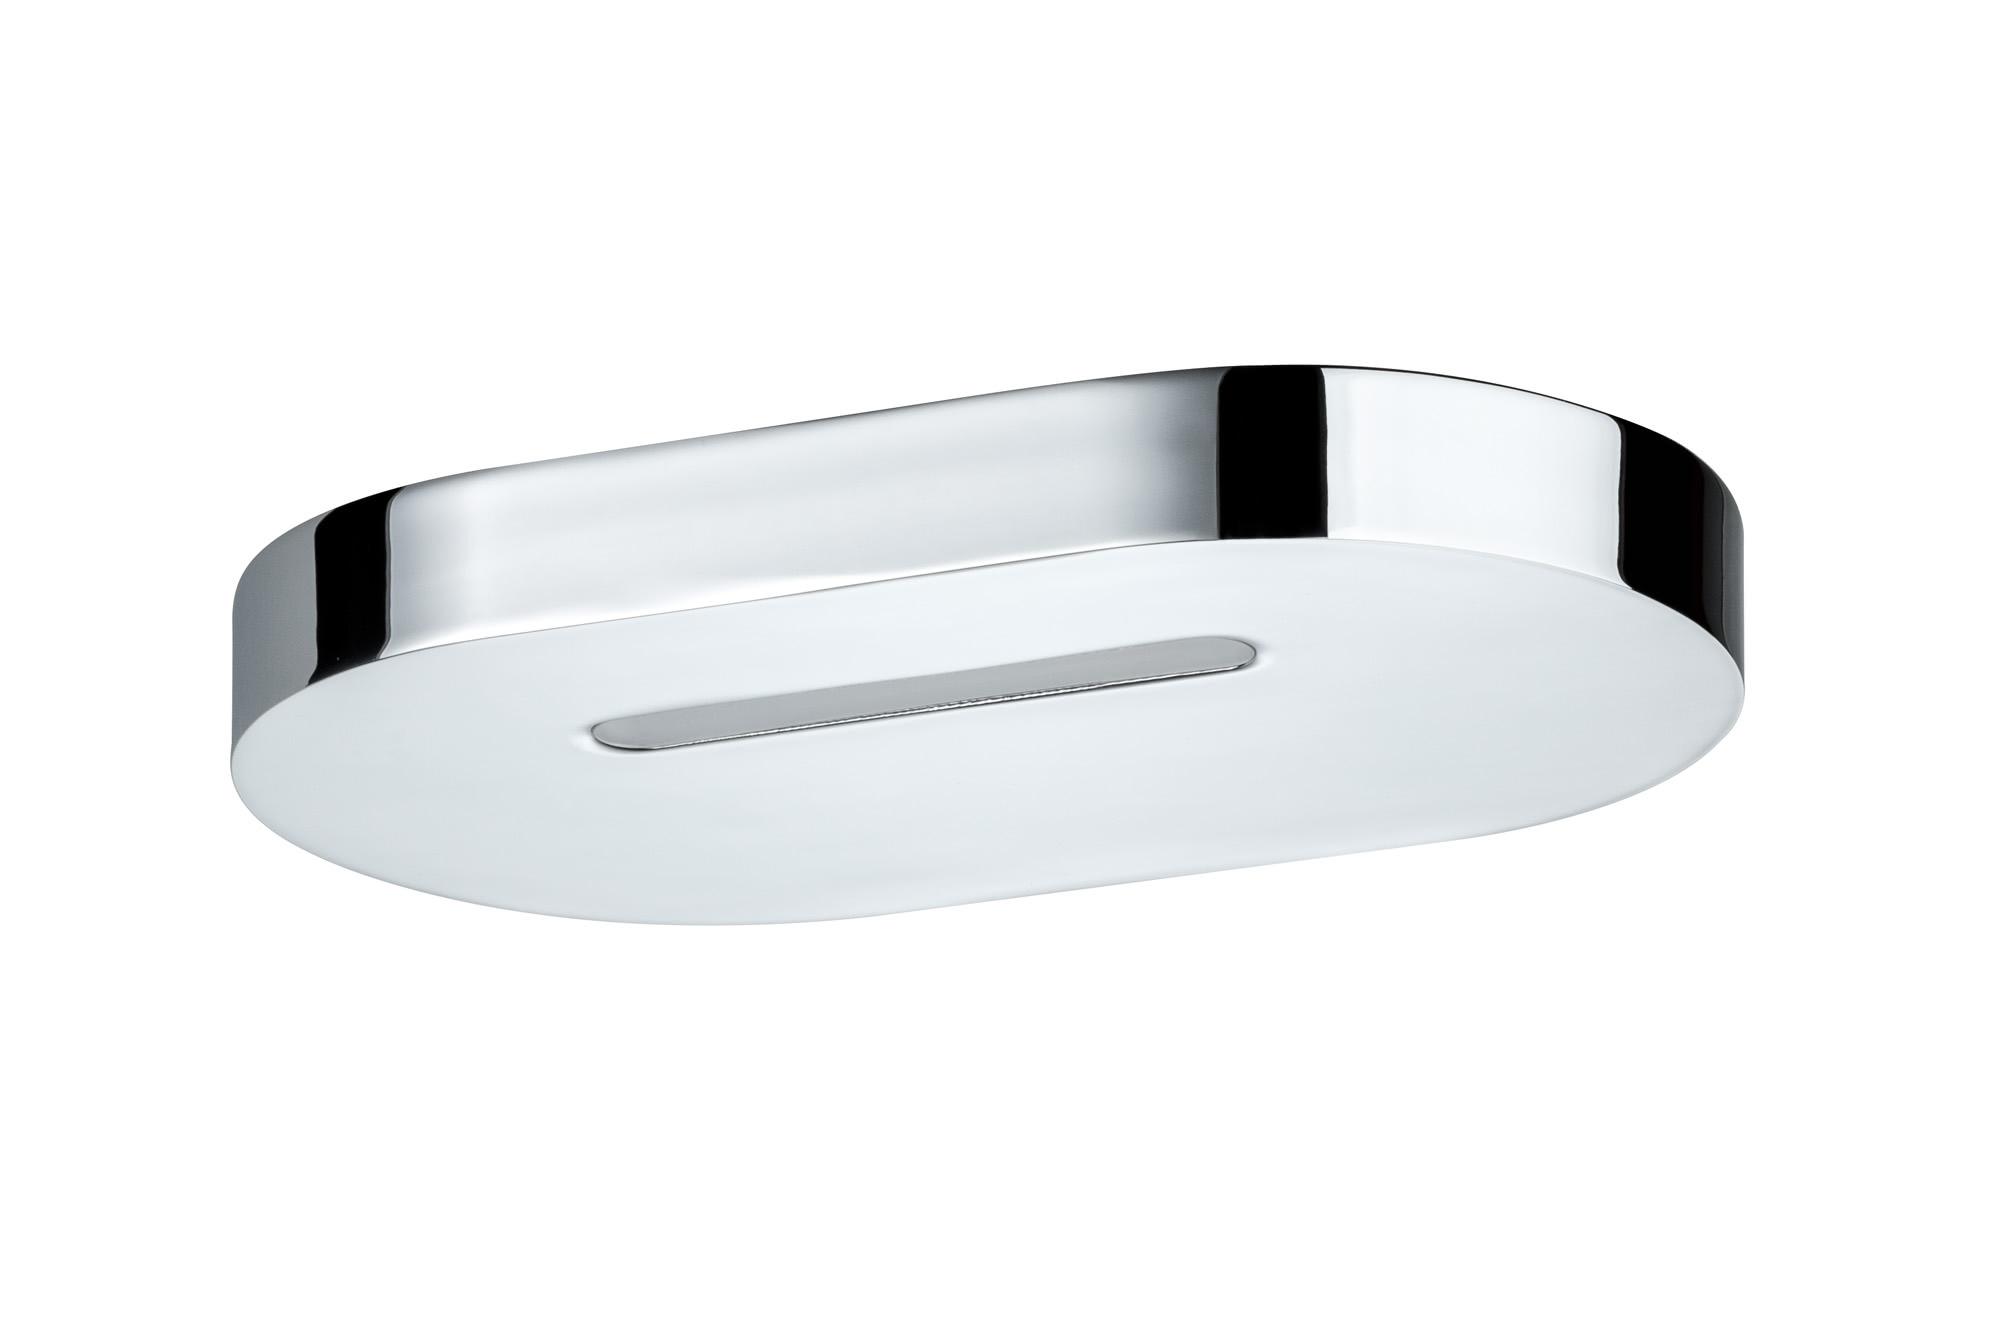 Paulmann. 70395 Светильник настенный Belona IP44 10W LED 120x200mm, хром